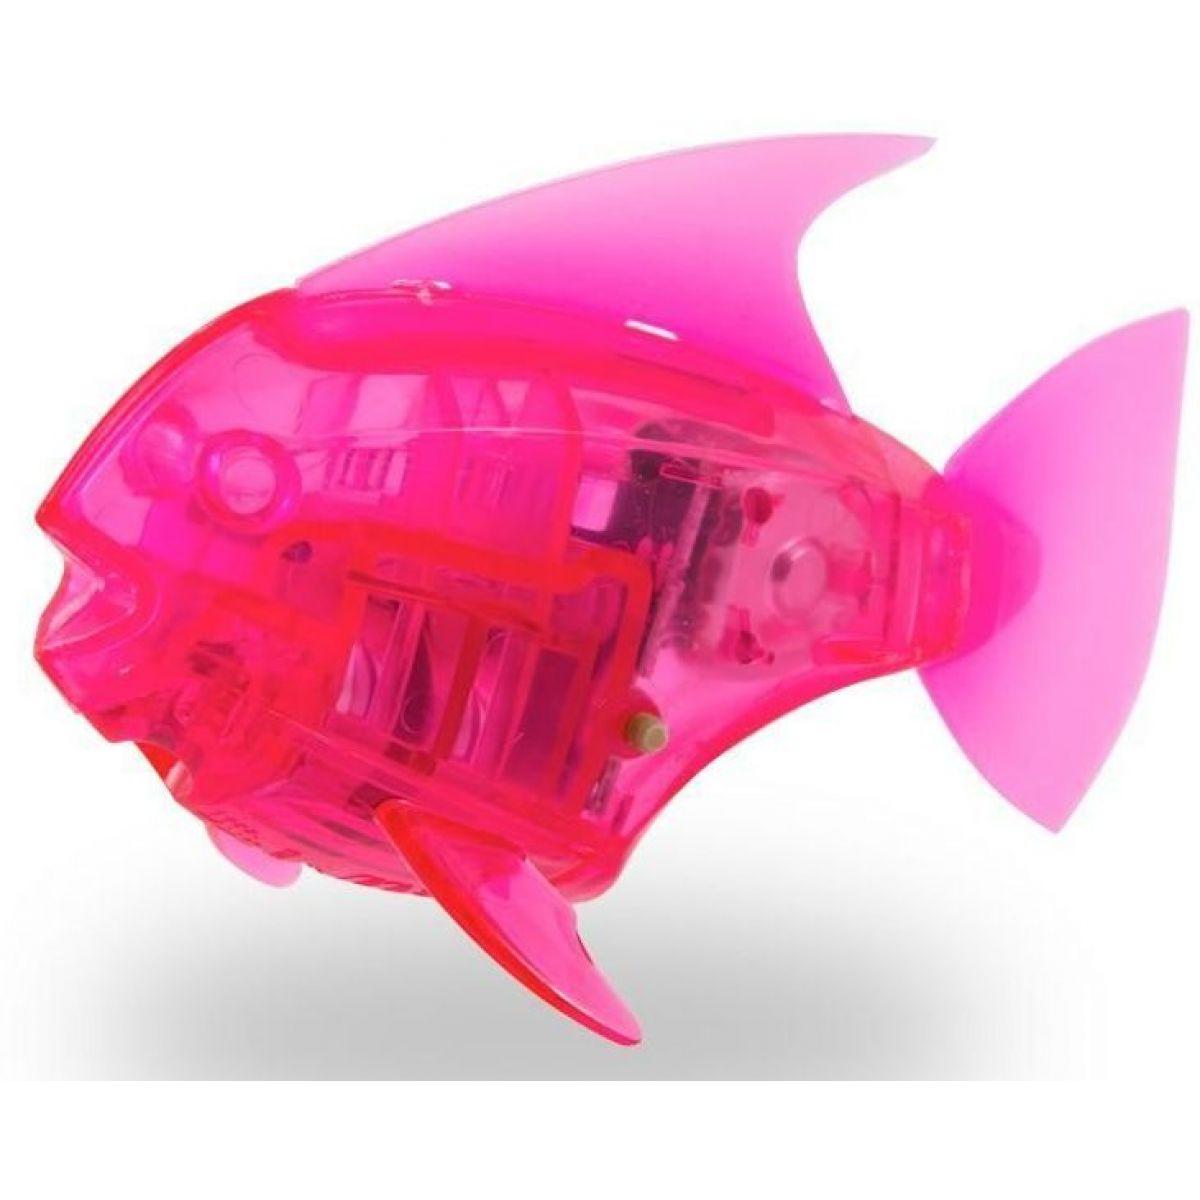 Hexbug Aquabot Led s akváriem Piraňa růžová